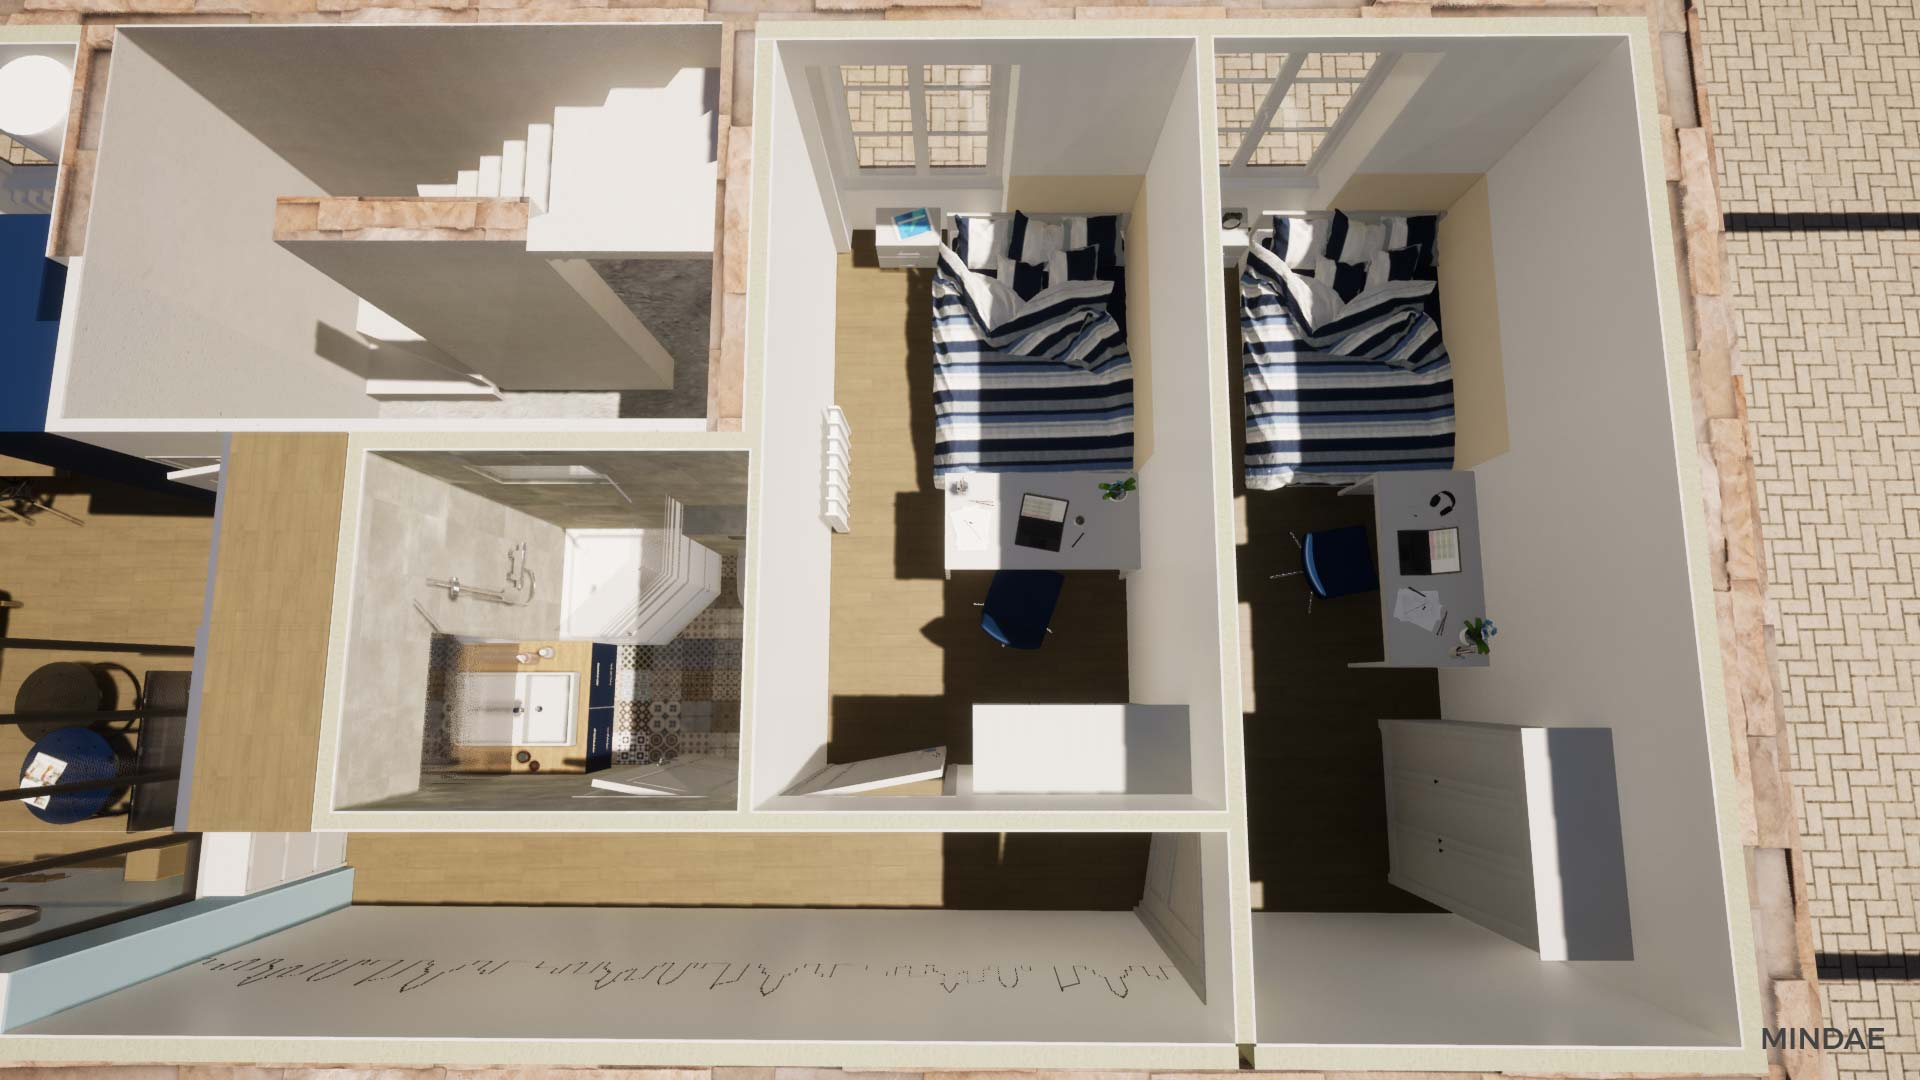 Mindae_3D_appartement_caen_saint_laurent_investisseur_colocation_airbnb_locatif_renovation_F2_F3-(10)